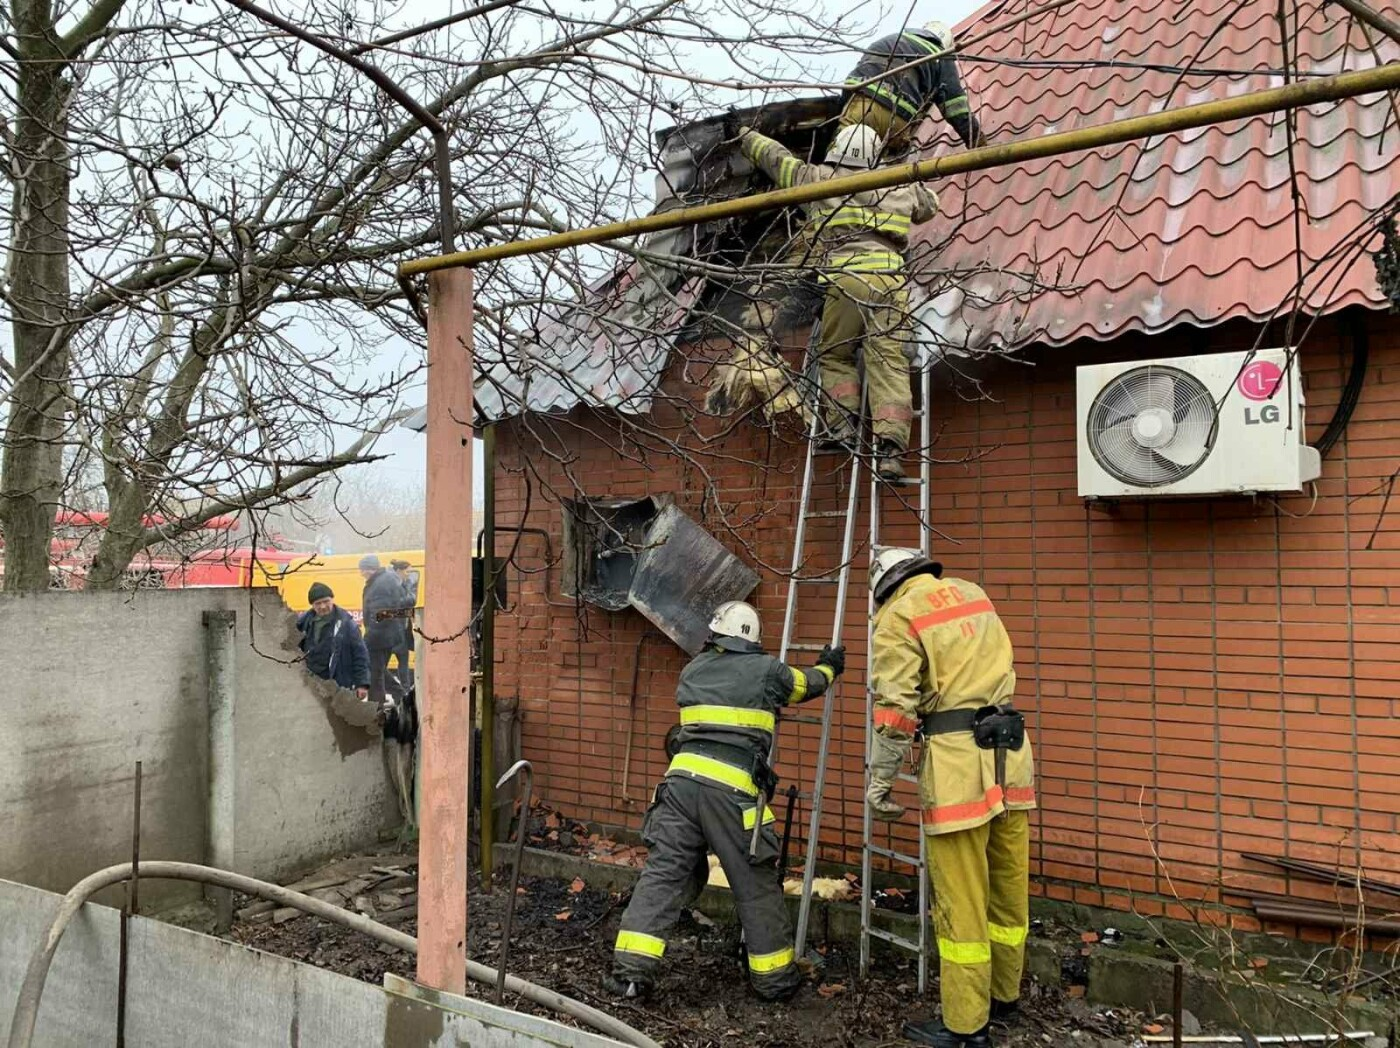 В Мелитополе при пожаре пострадал человек, - ФОТО, фото-2